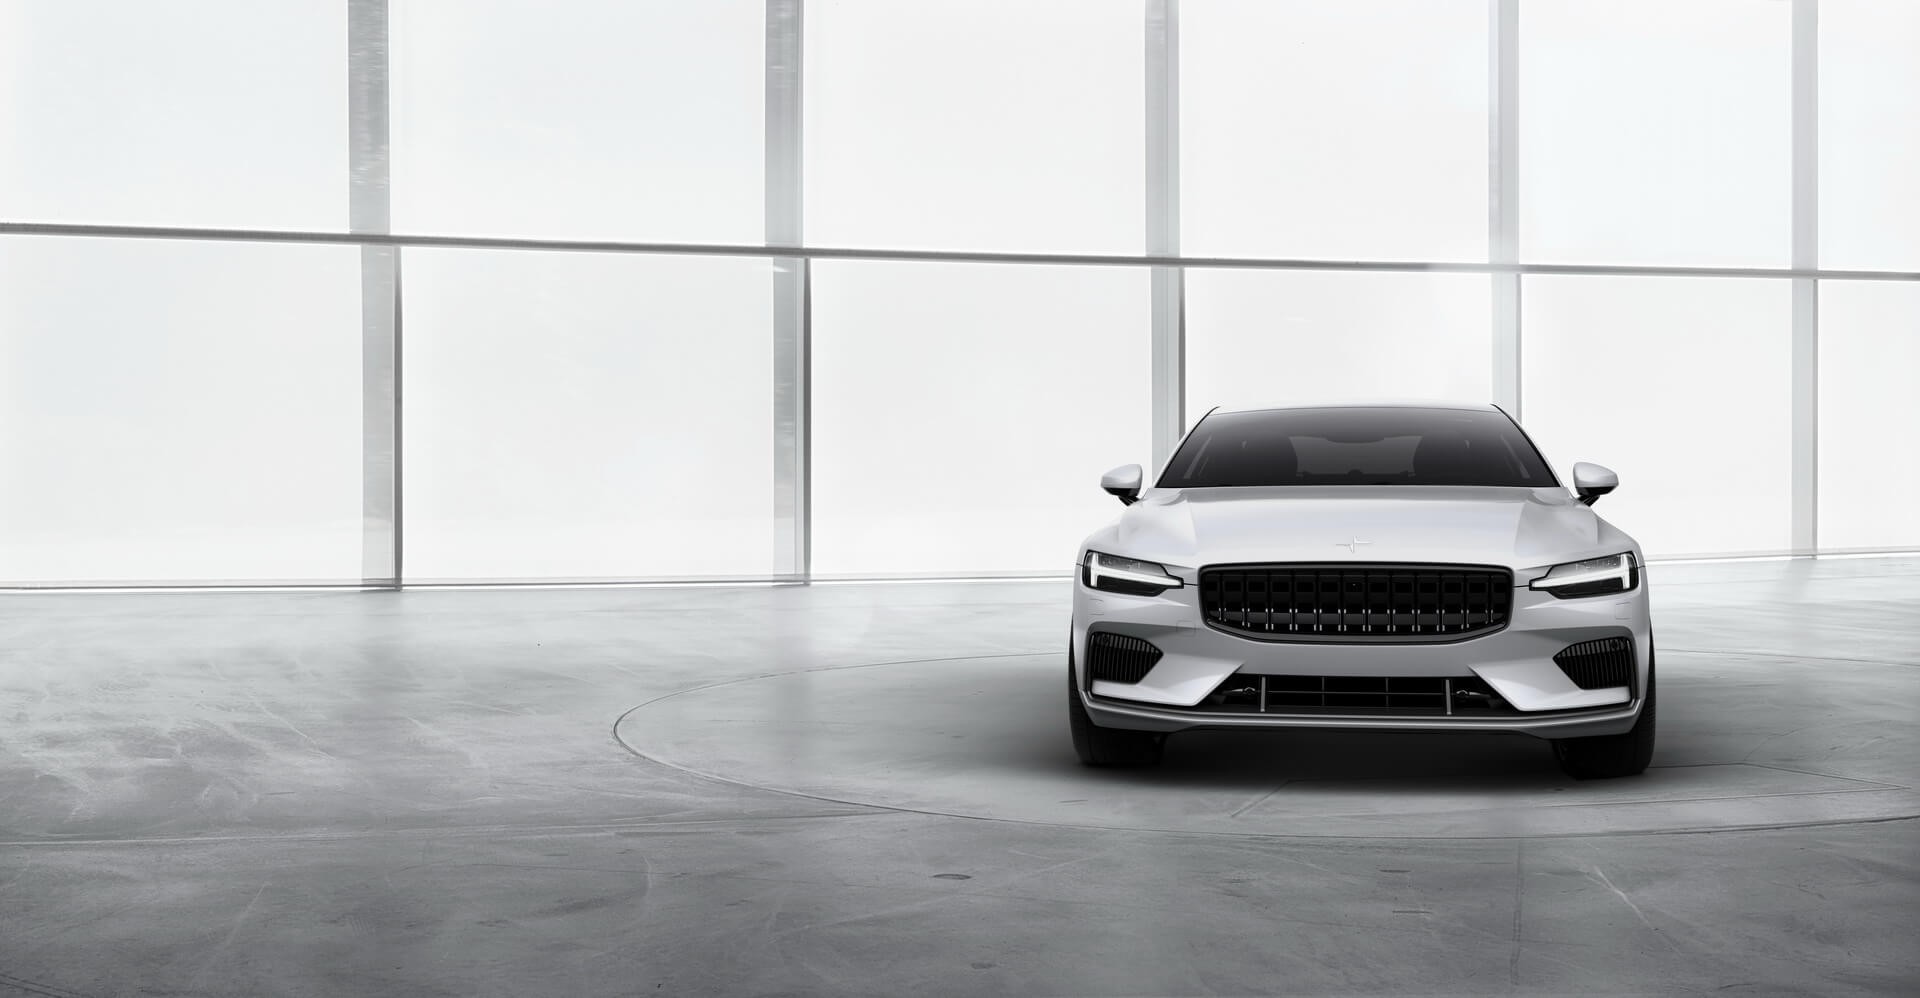 Brend Polestar kompanii Volvo pristupil k sborke prototipa sportkara1